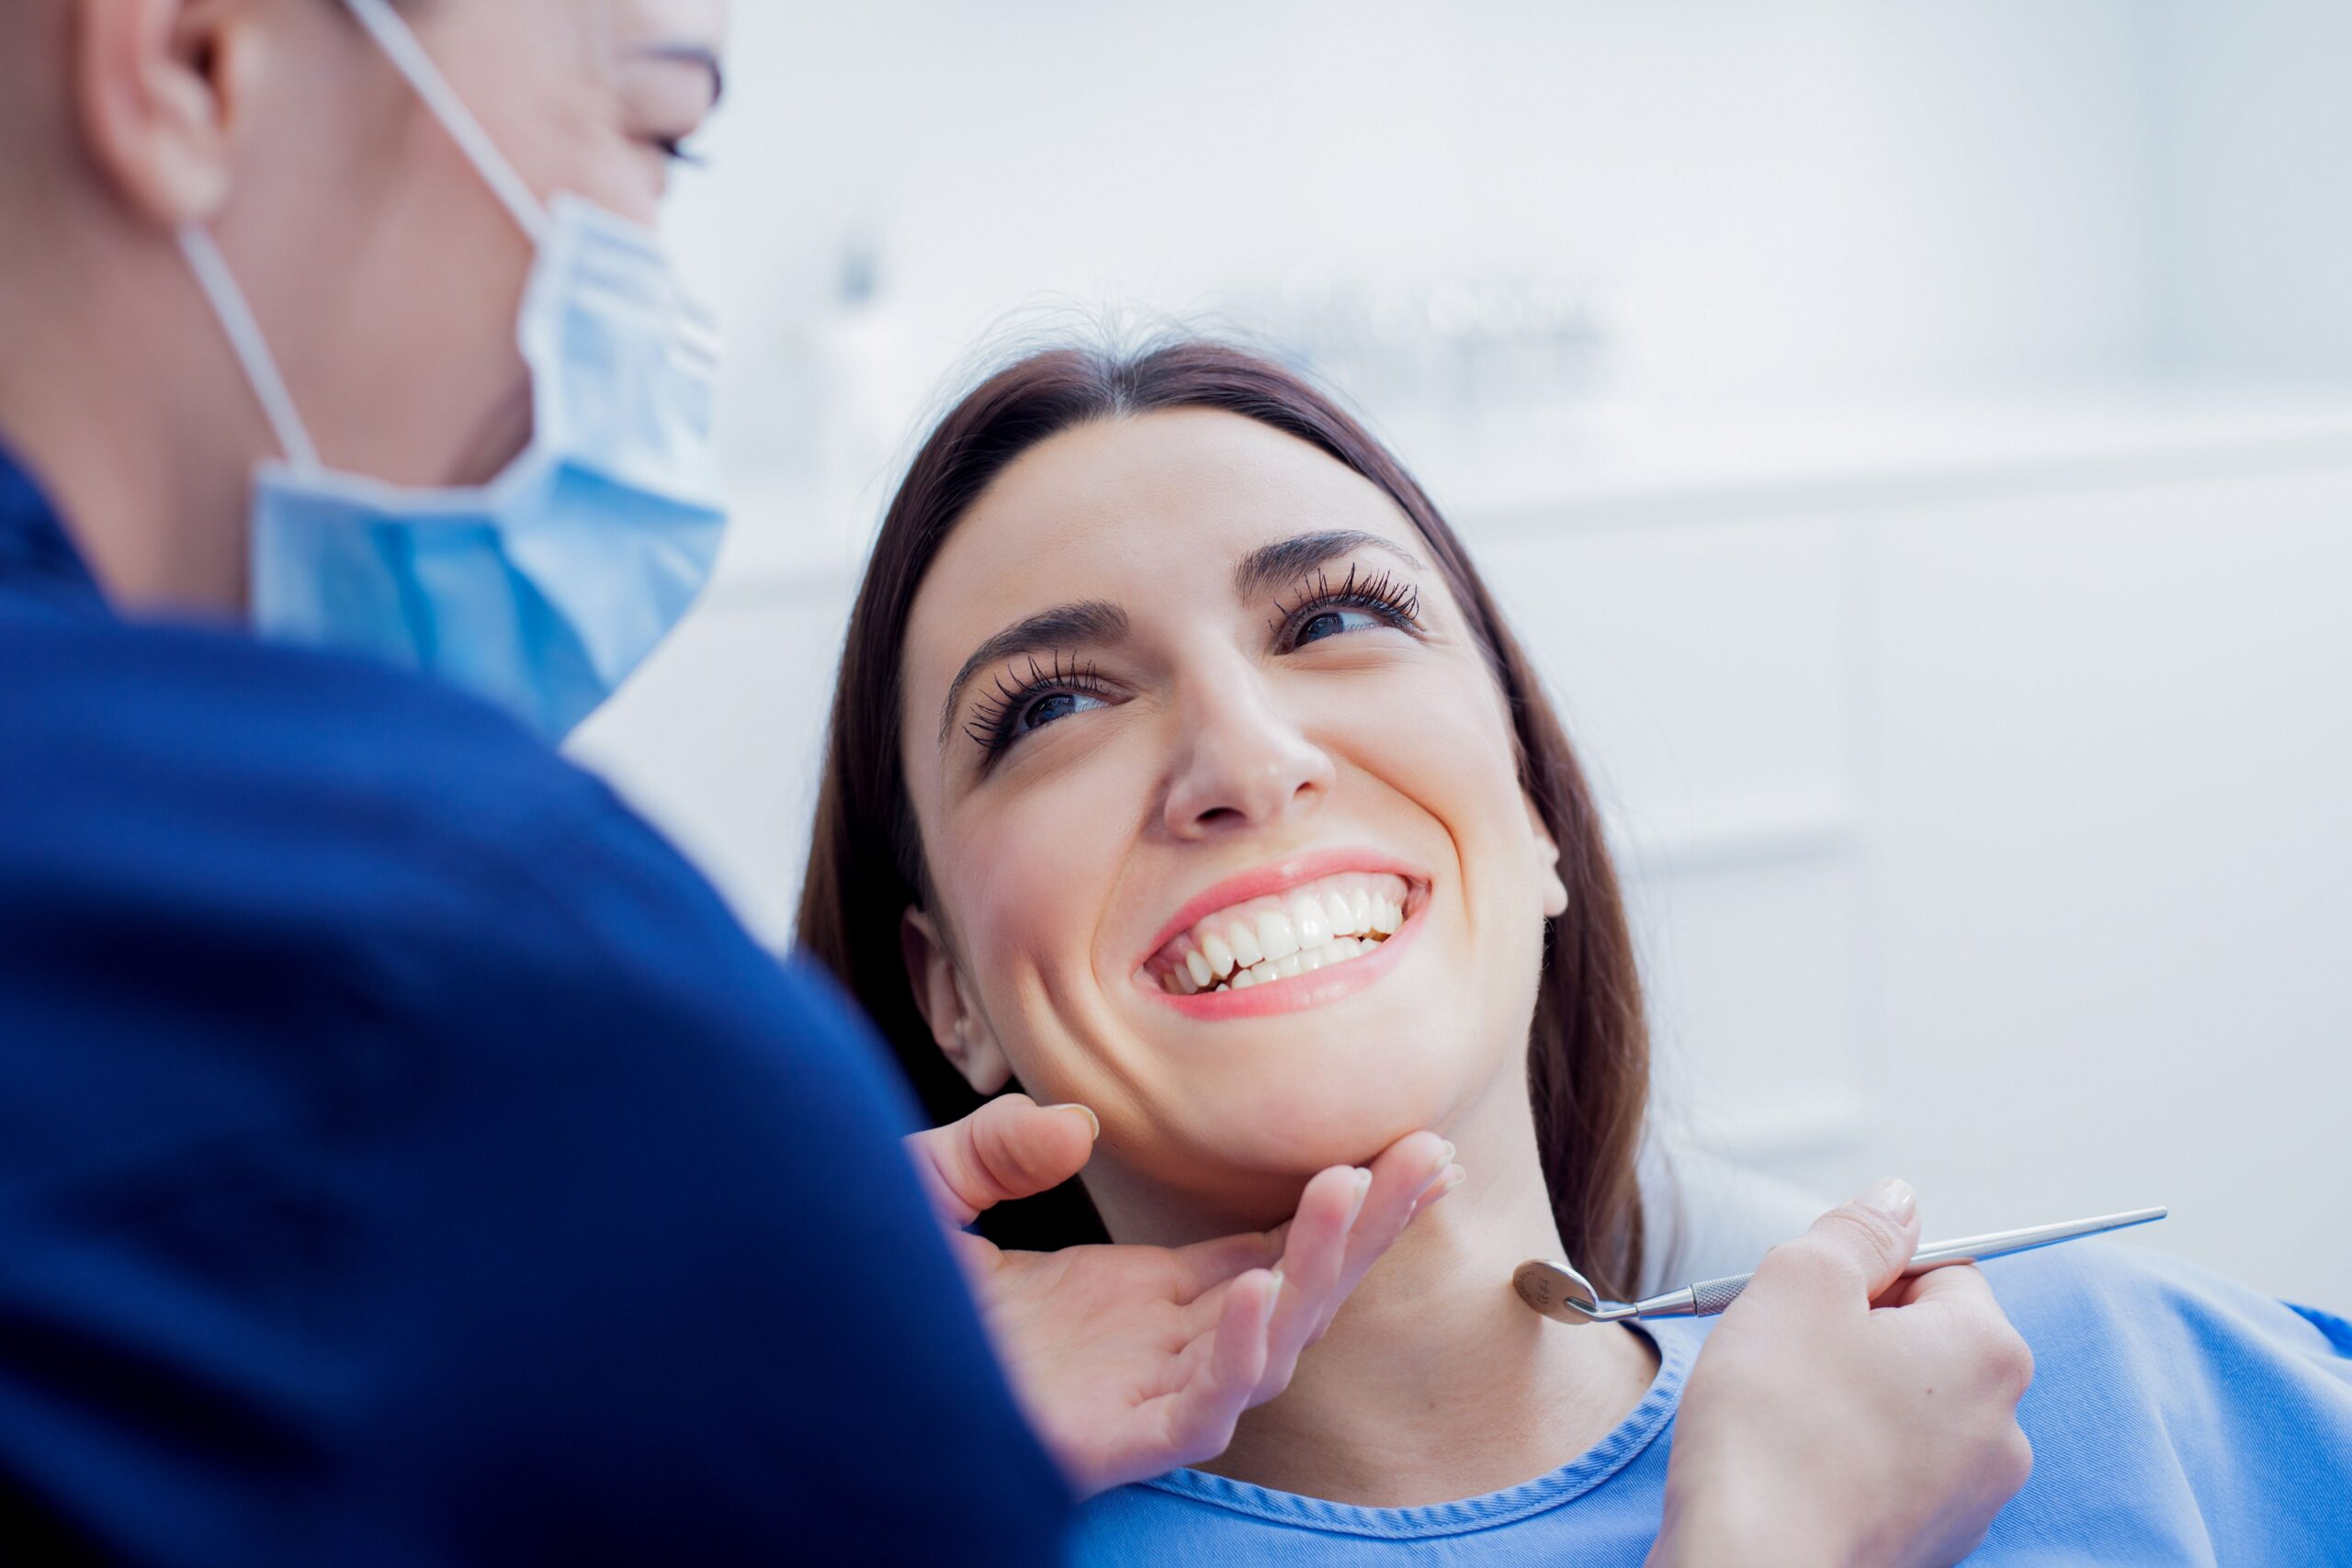 Family Dentist in Primghar IA | Do I Really Need an Exam?